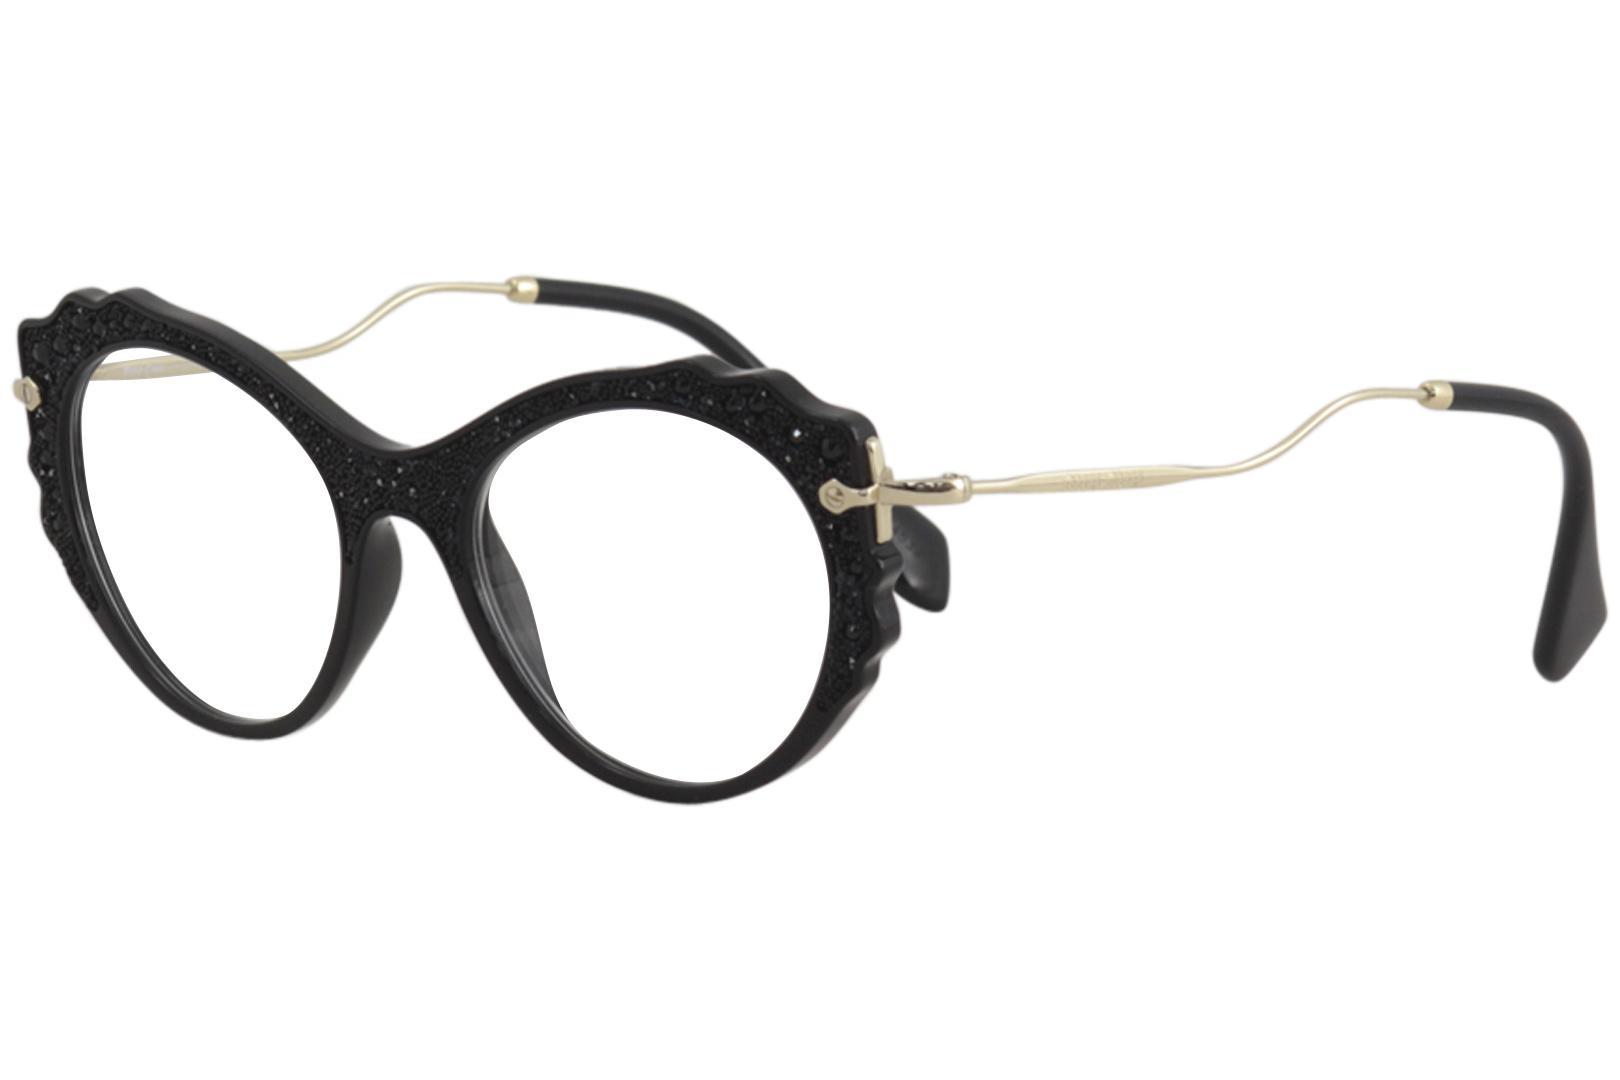 Miu Miu Women\'s Eyeglasses MU01PV MU/01/PV Full Rim Optical Frame